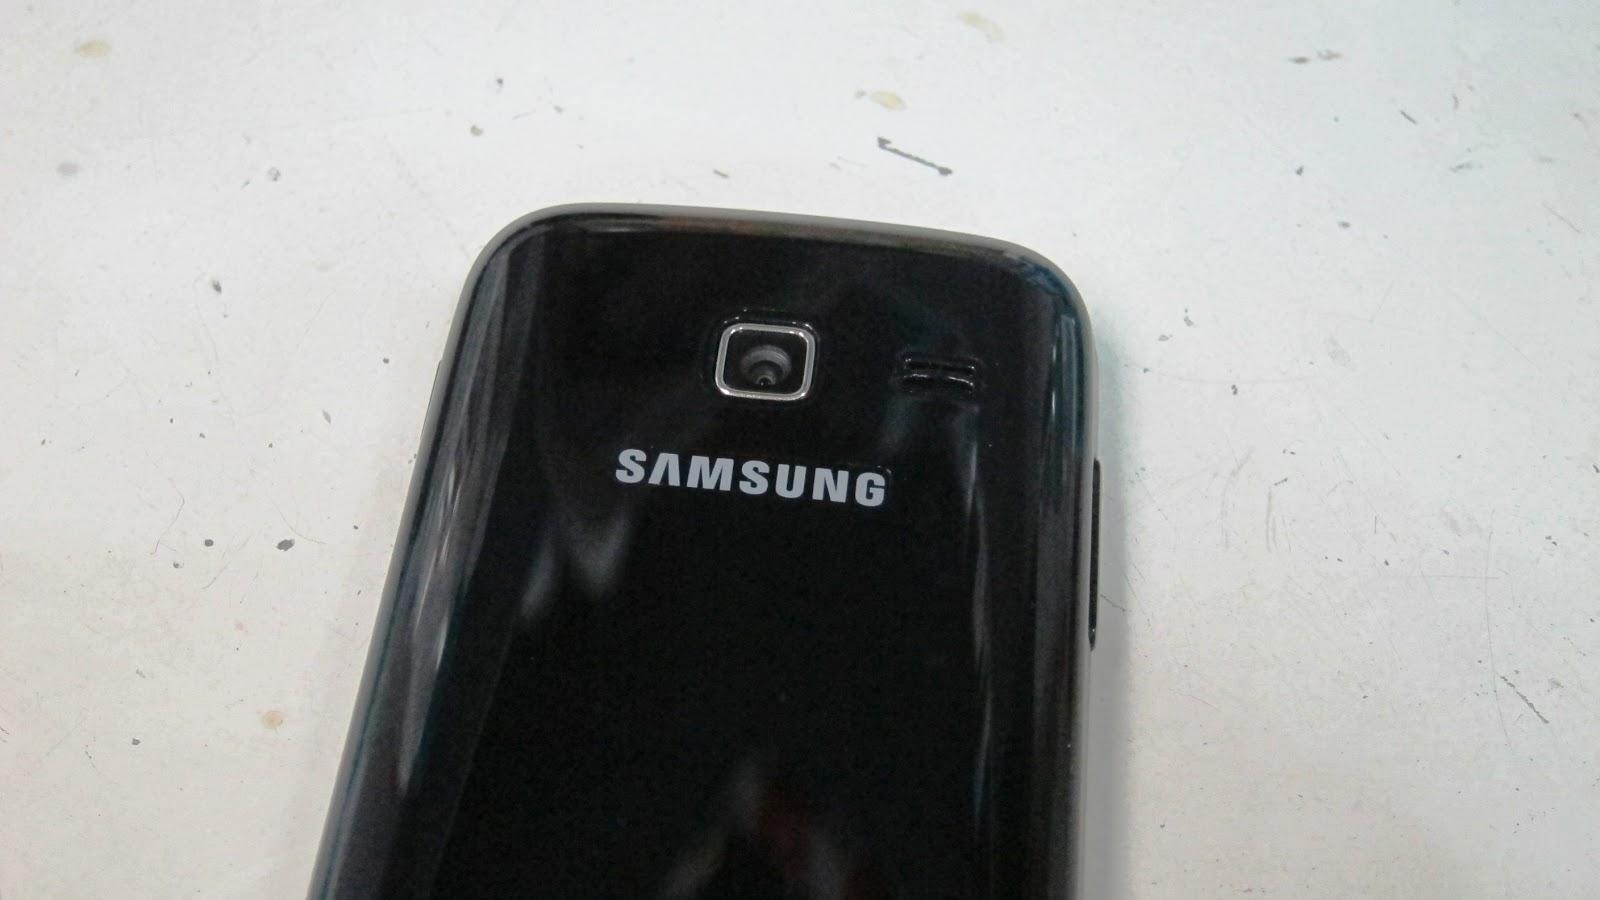 imagens de celular samsung duos - Smartphone Samsung Galaxy S Duos S7562 4GB Android